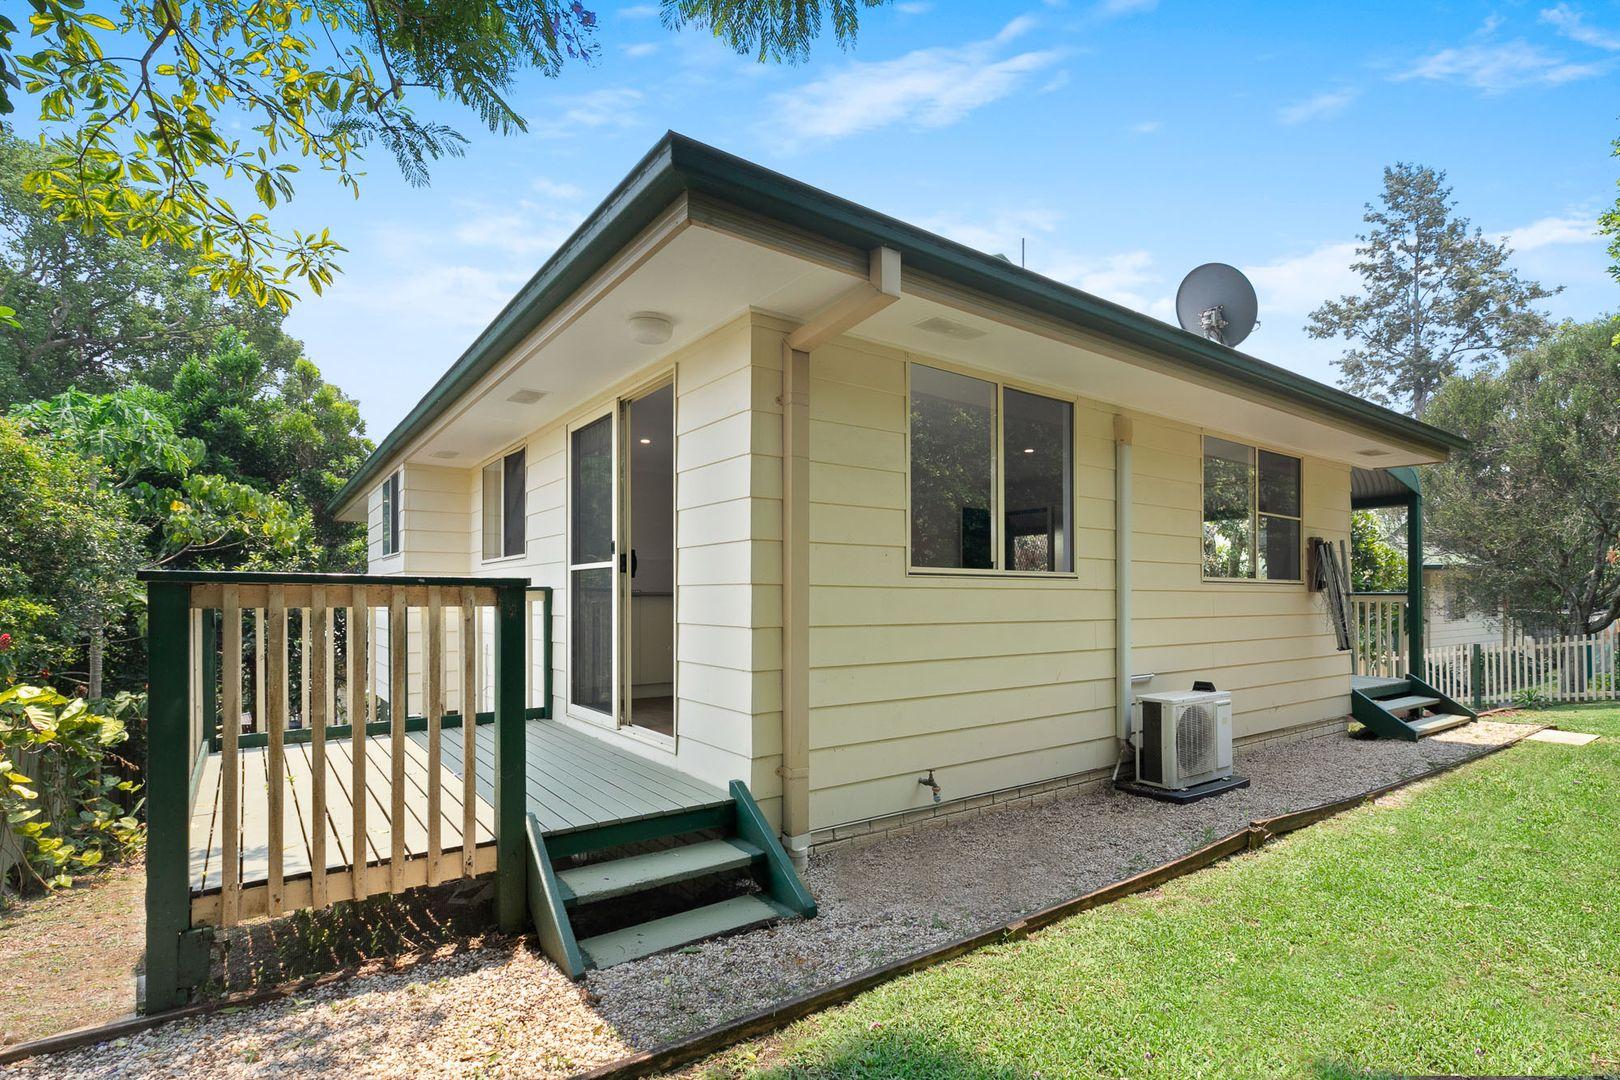 2/9 Colin Street, Bangalow NSW 2479, Image 1